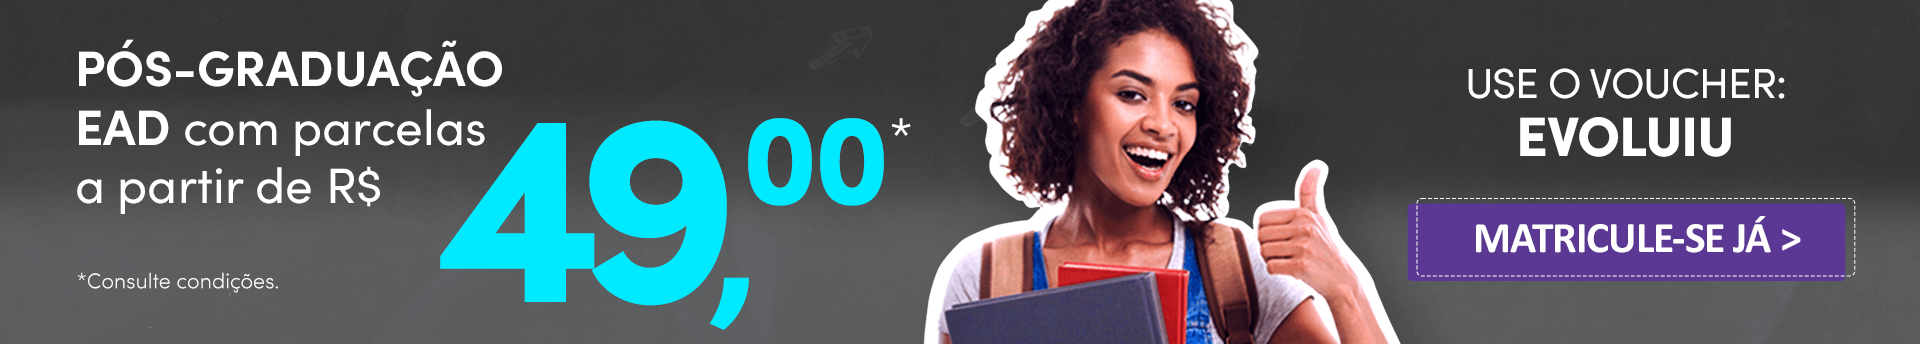 Cursos de Pós: Bolsas de estudo